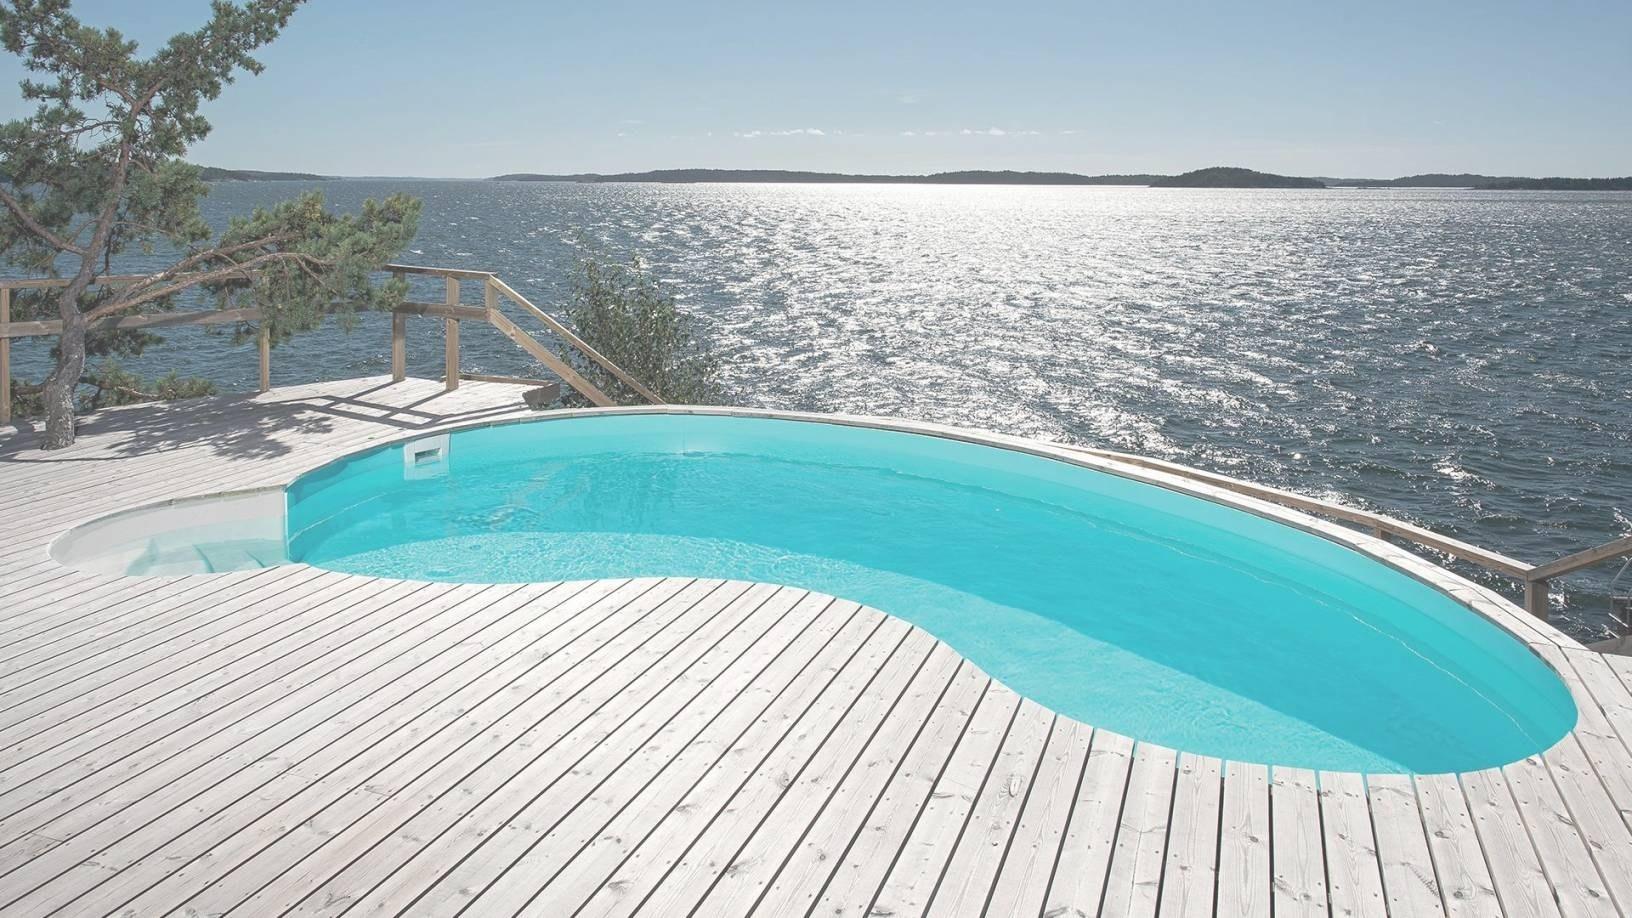 Pompe piscine cdiscount finest abri pompe piscine hors for Abri de filtration piscine hors sol